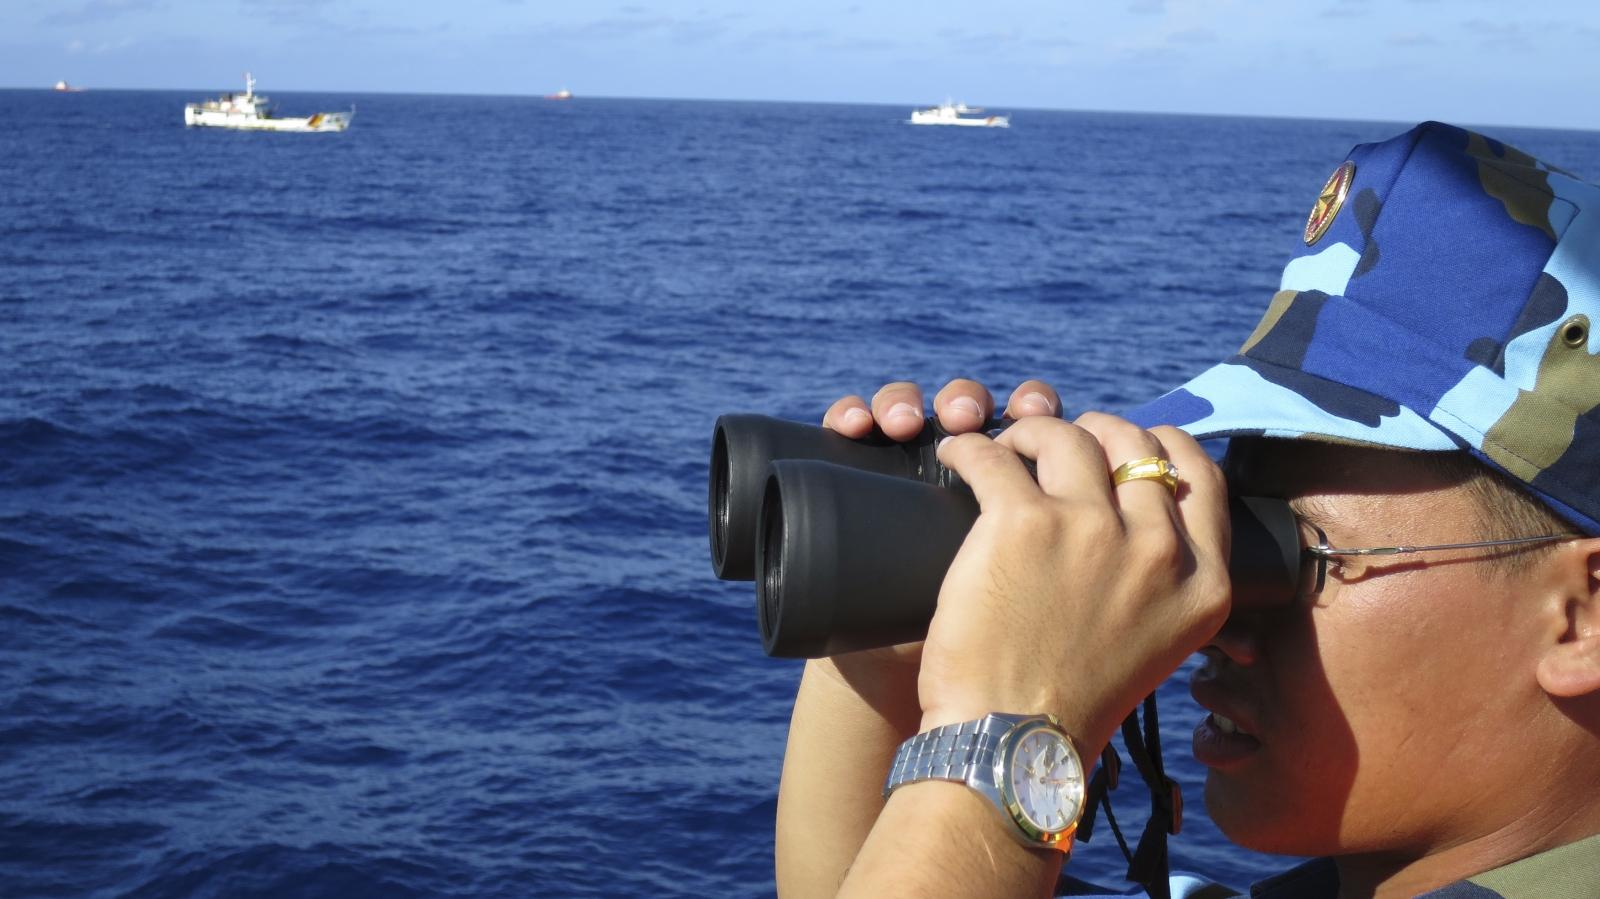 Captain of Norwegian ship which sank off Vietnam coast confirmed dead